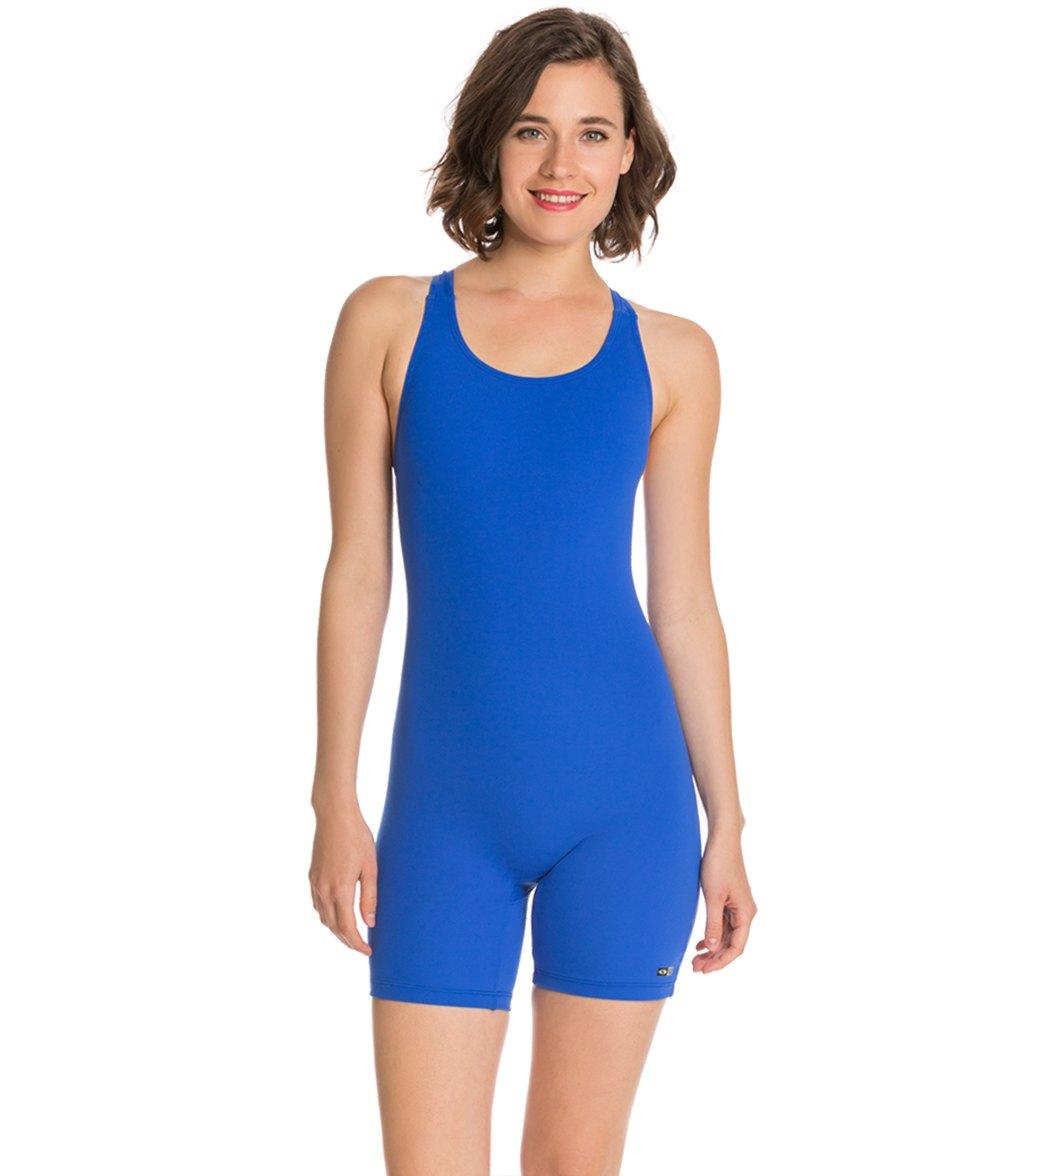 Eq Swimwear Spectrum Unitard